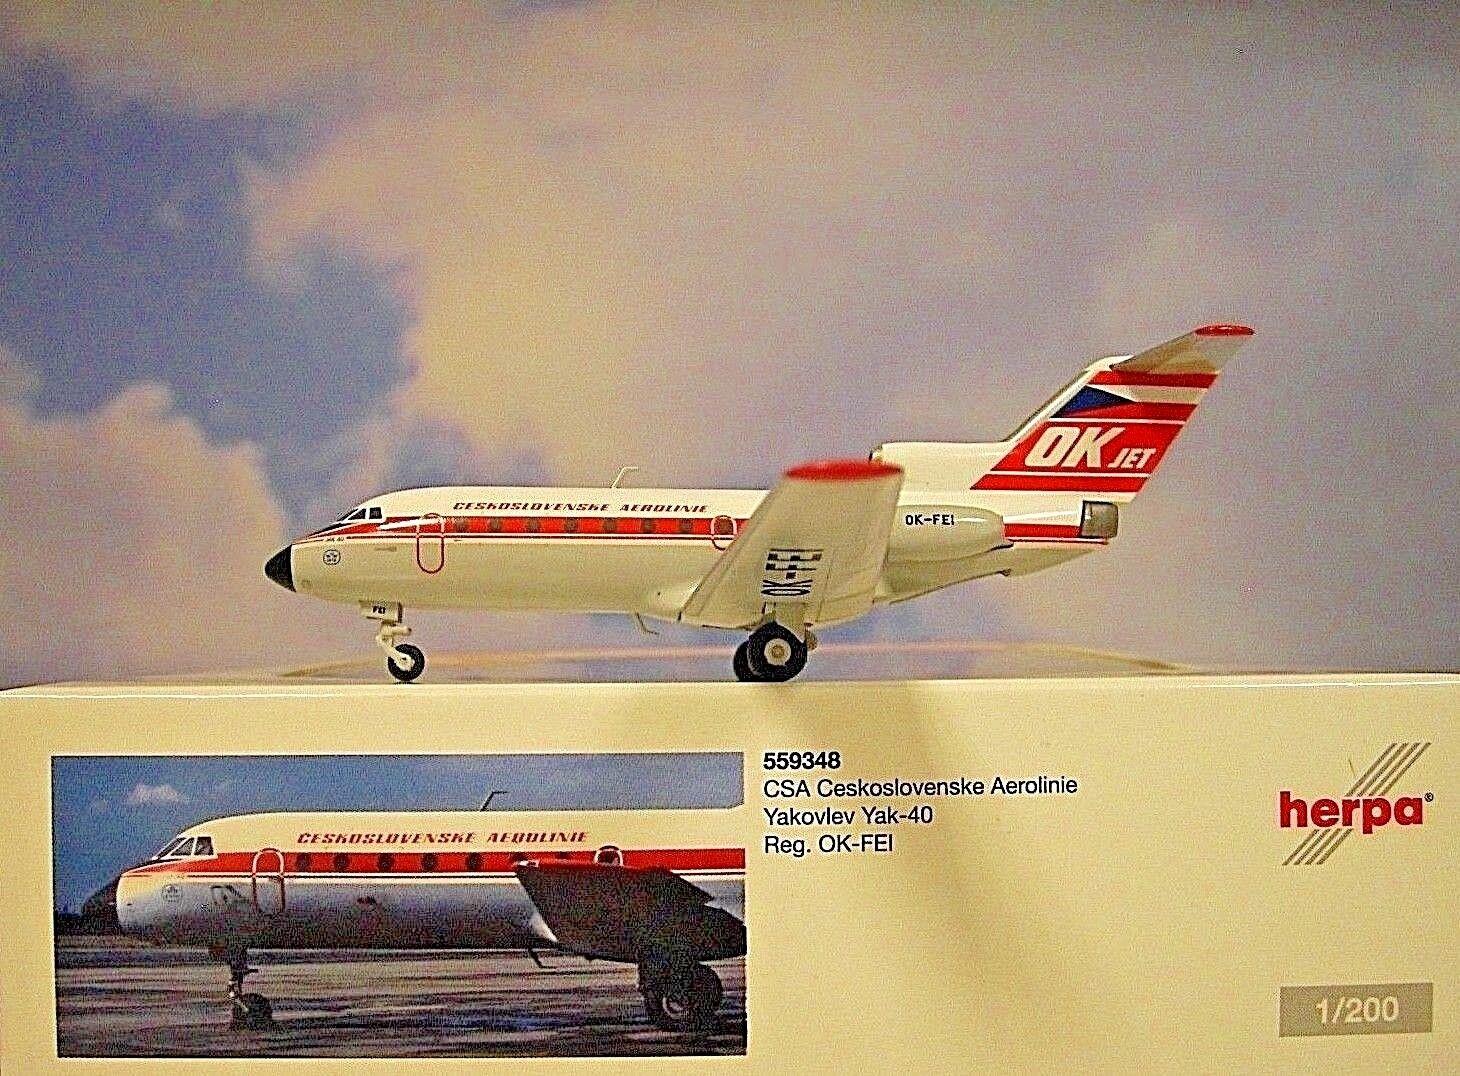 Herpa Wings 1 200 Yakovlev yak-40 CSA Ceskoslovenske Aerolinie OK-Fei 559348